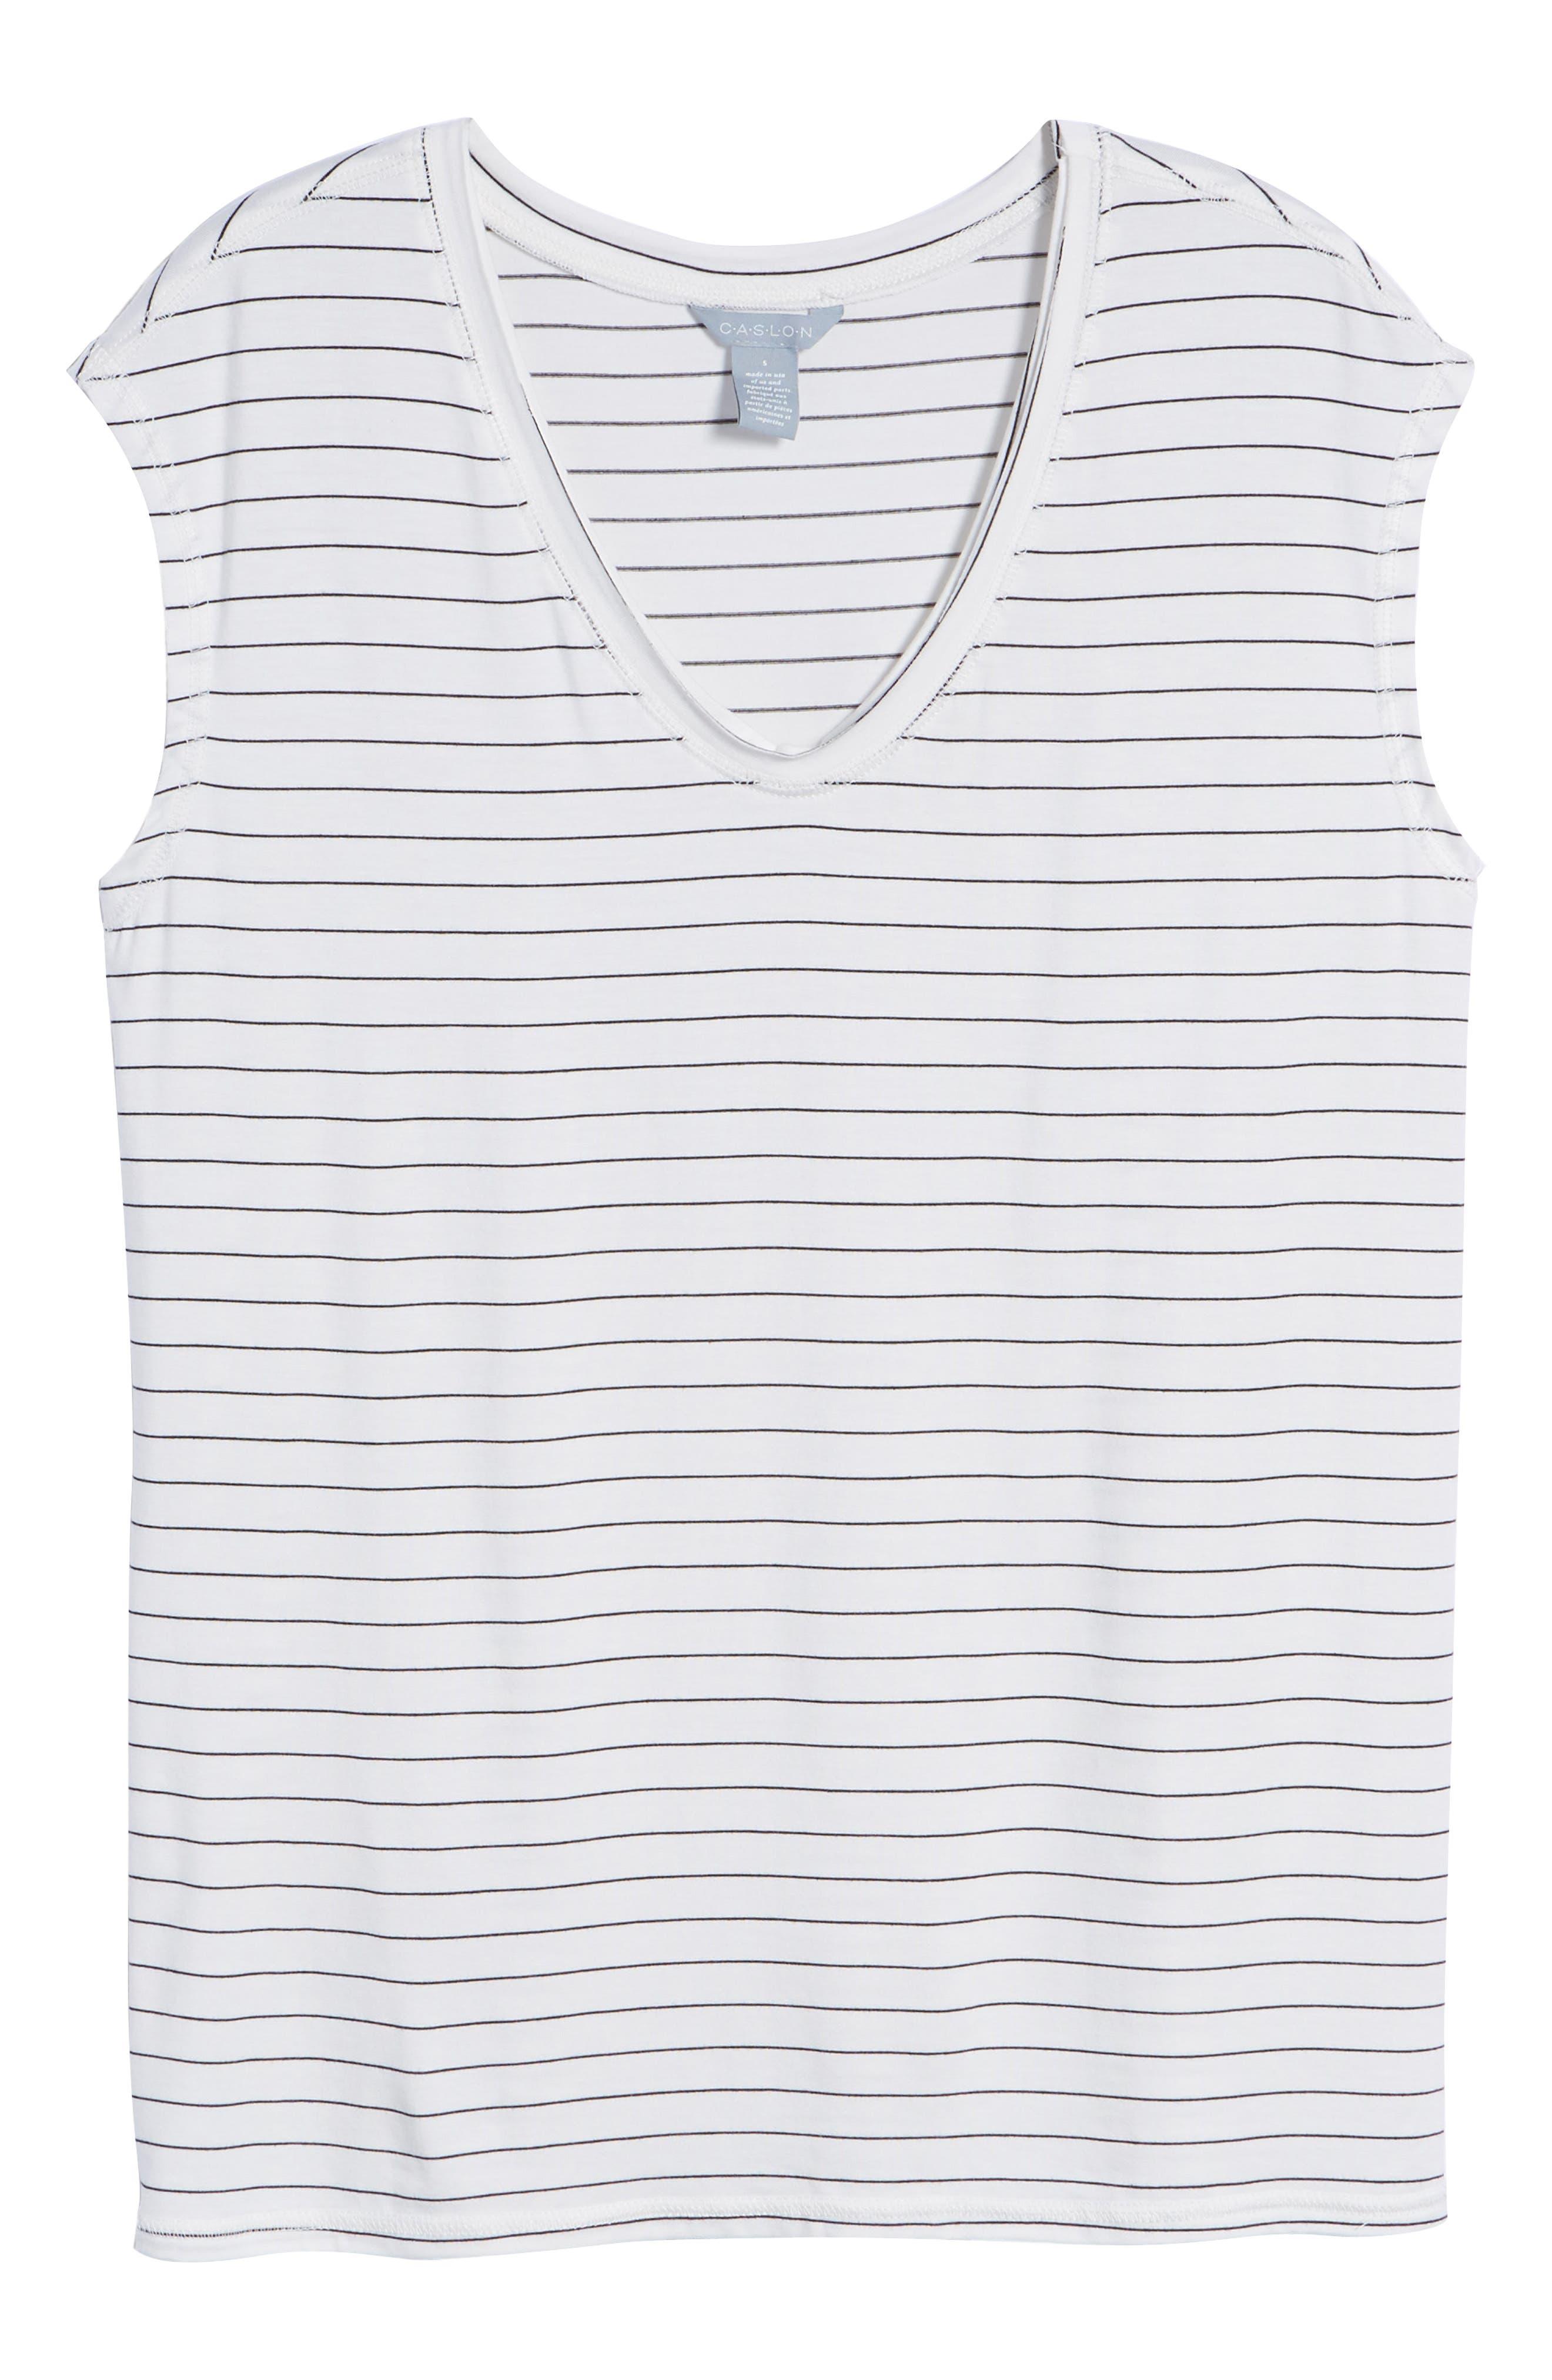 Off-Duty Sleeveless Stretch Knit Top,                             Alternate thumbnail 6, color,                             White- Black Cloud Stripe